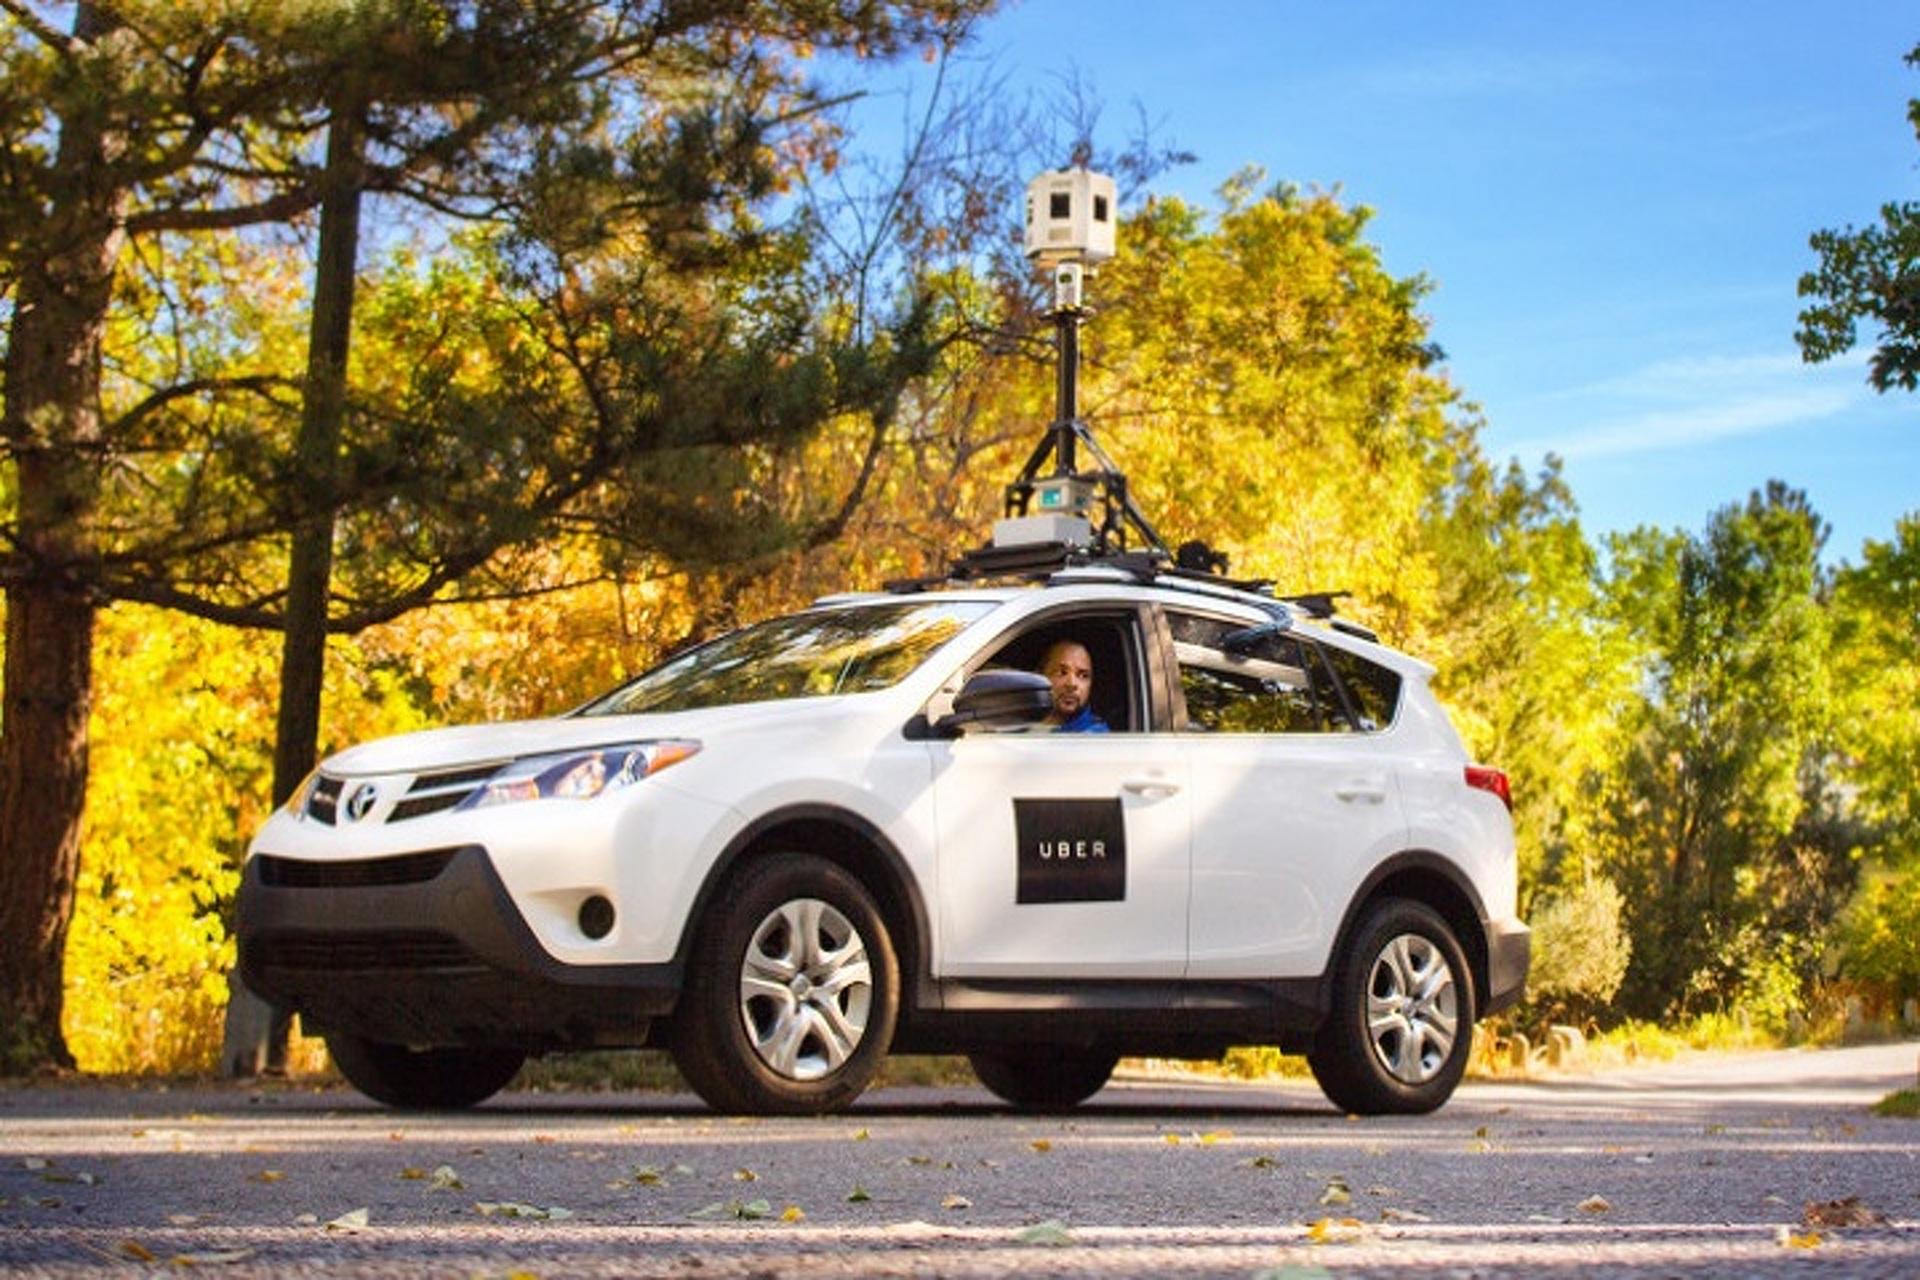 Uber Raising Billions as Rivals Form International Alliance